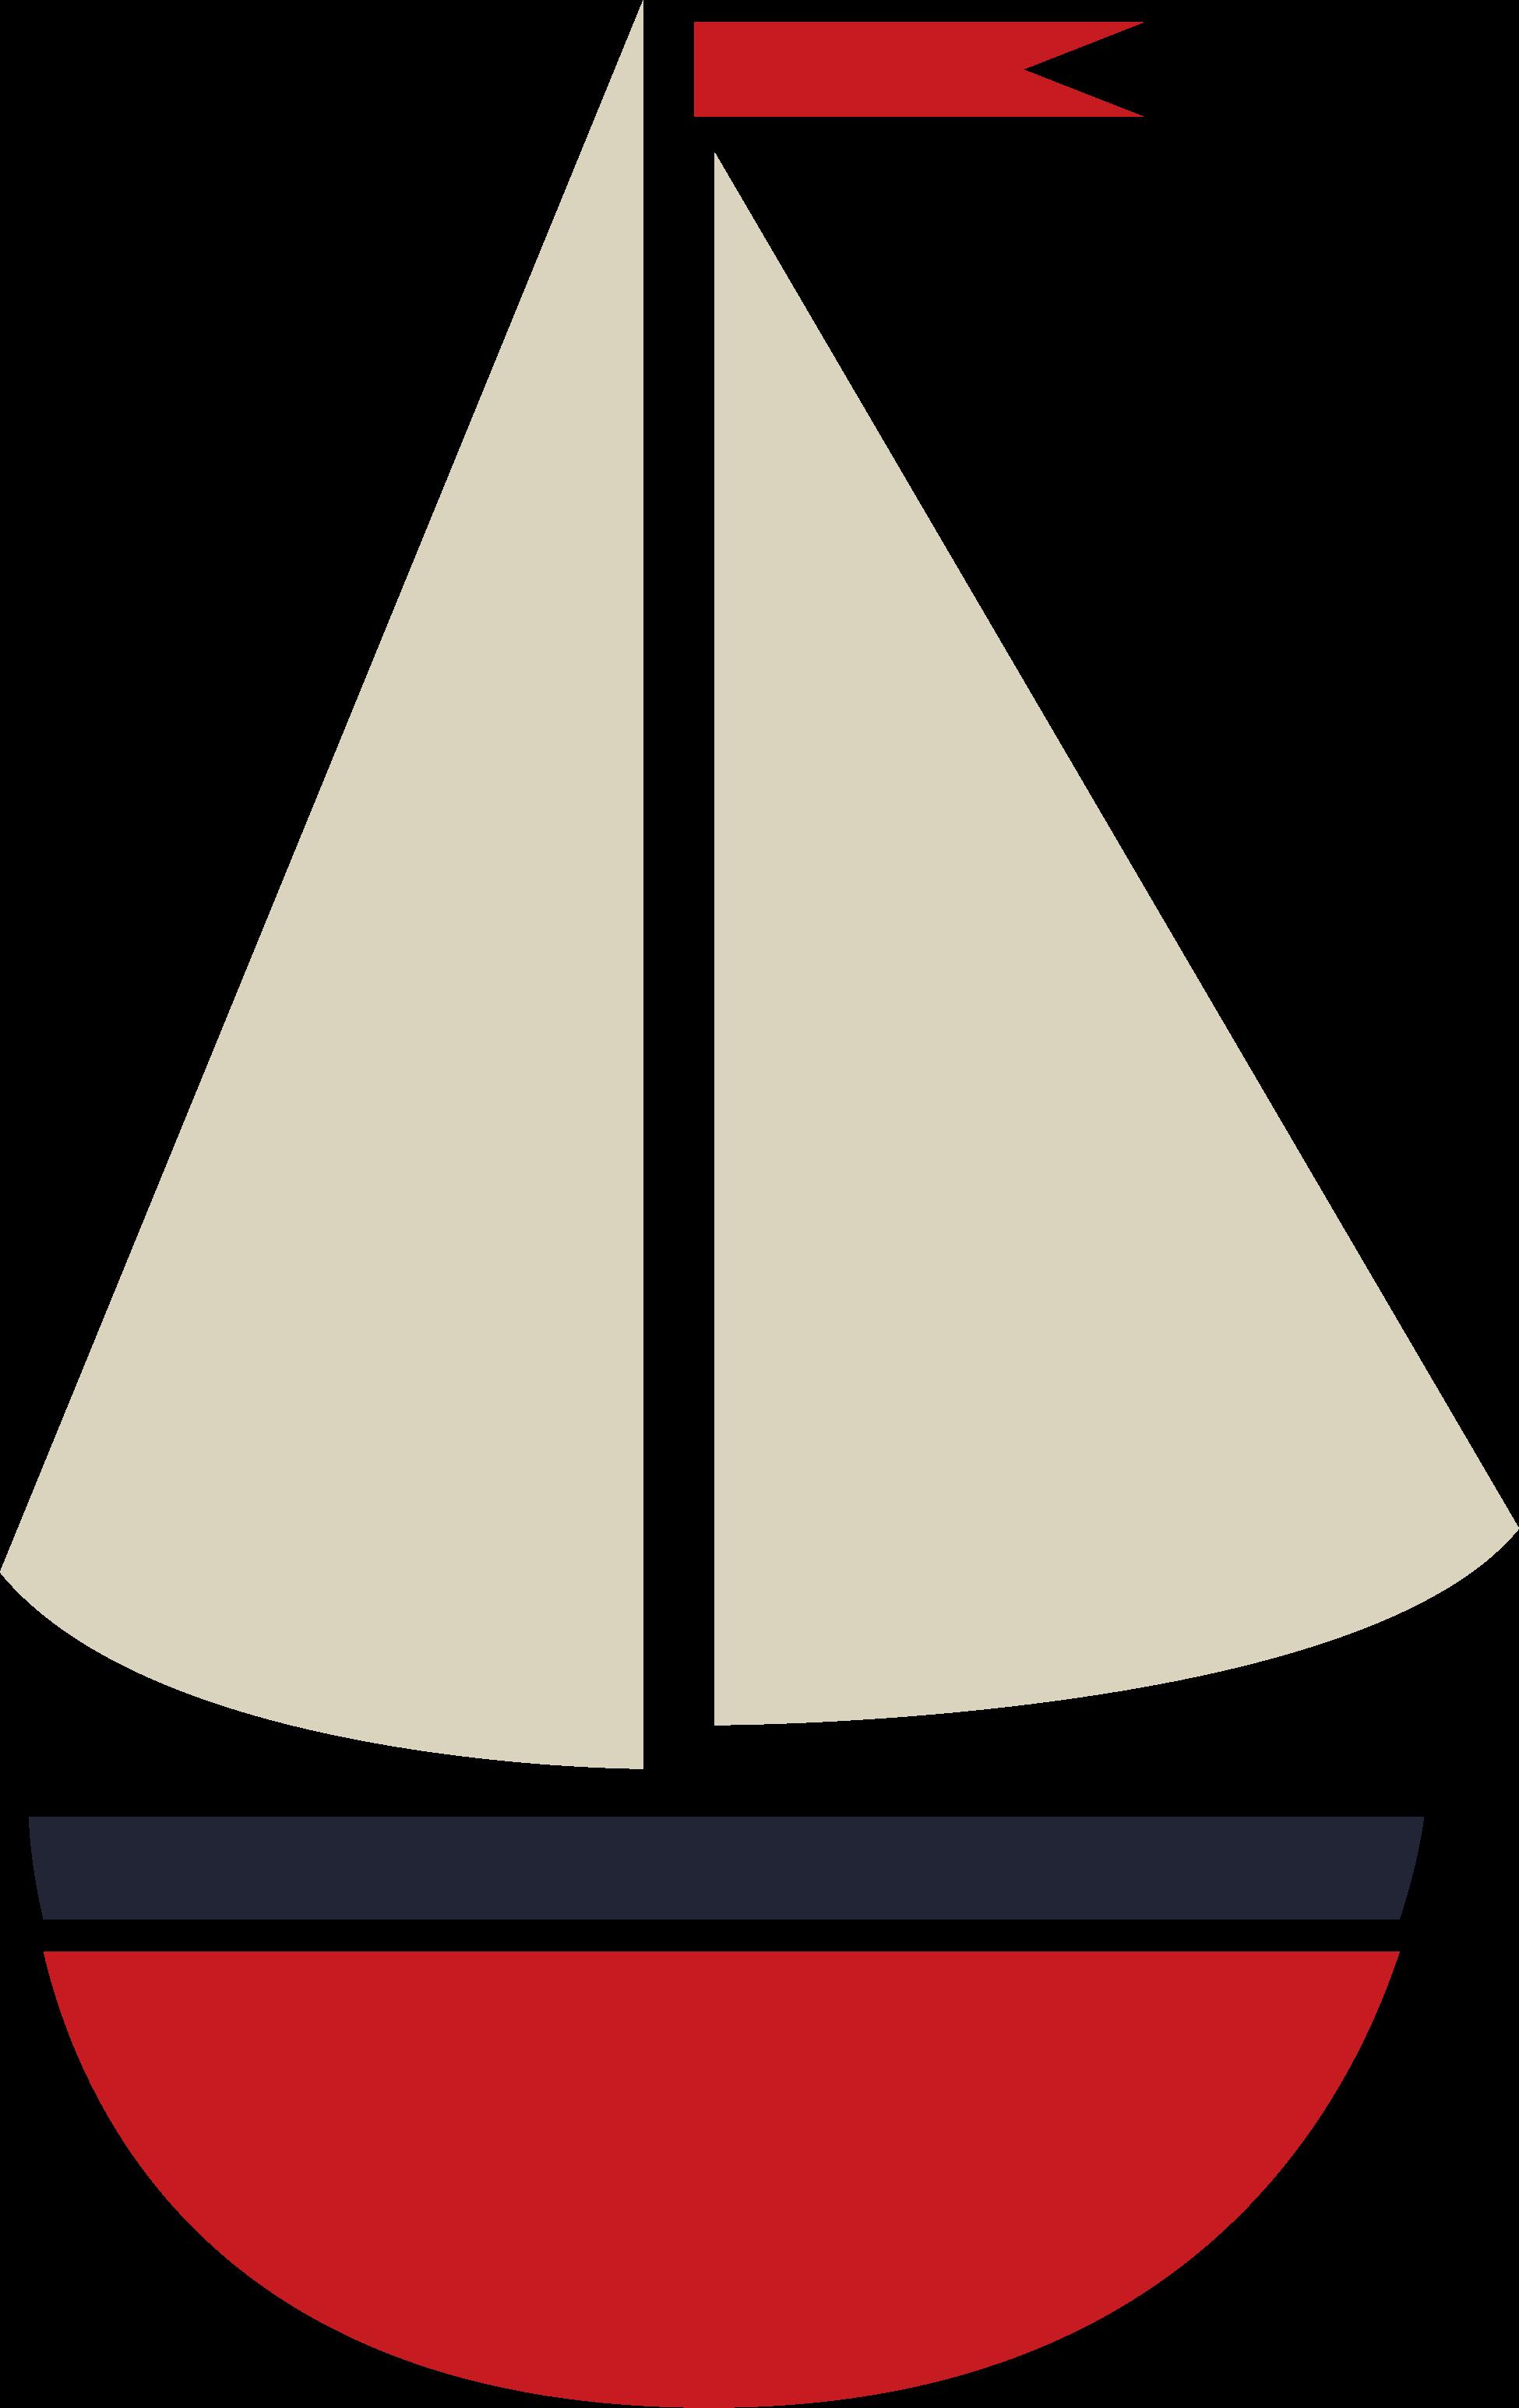 Deep Blue Sea Sailboat #2 SVG Cut File